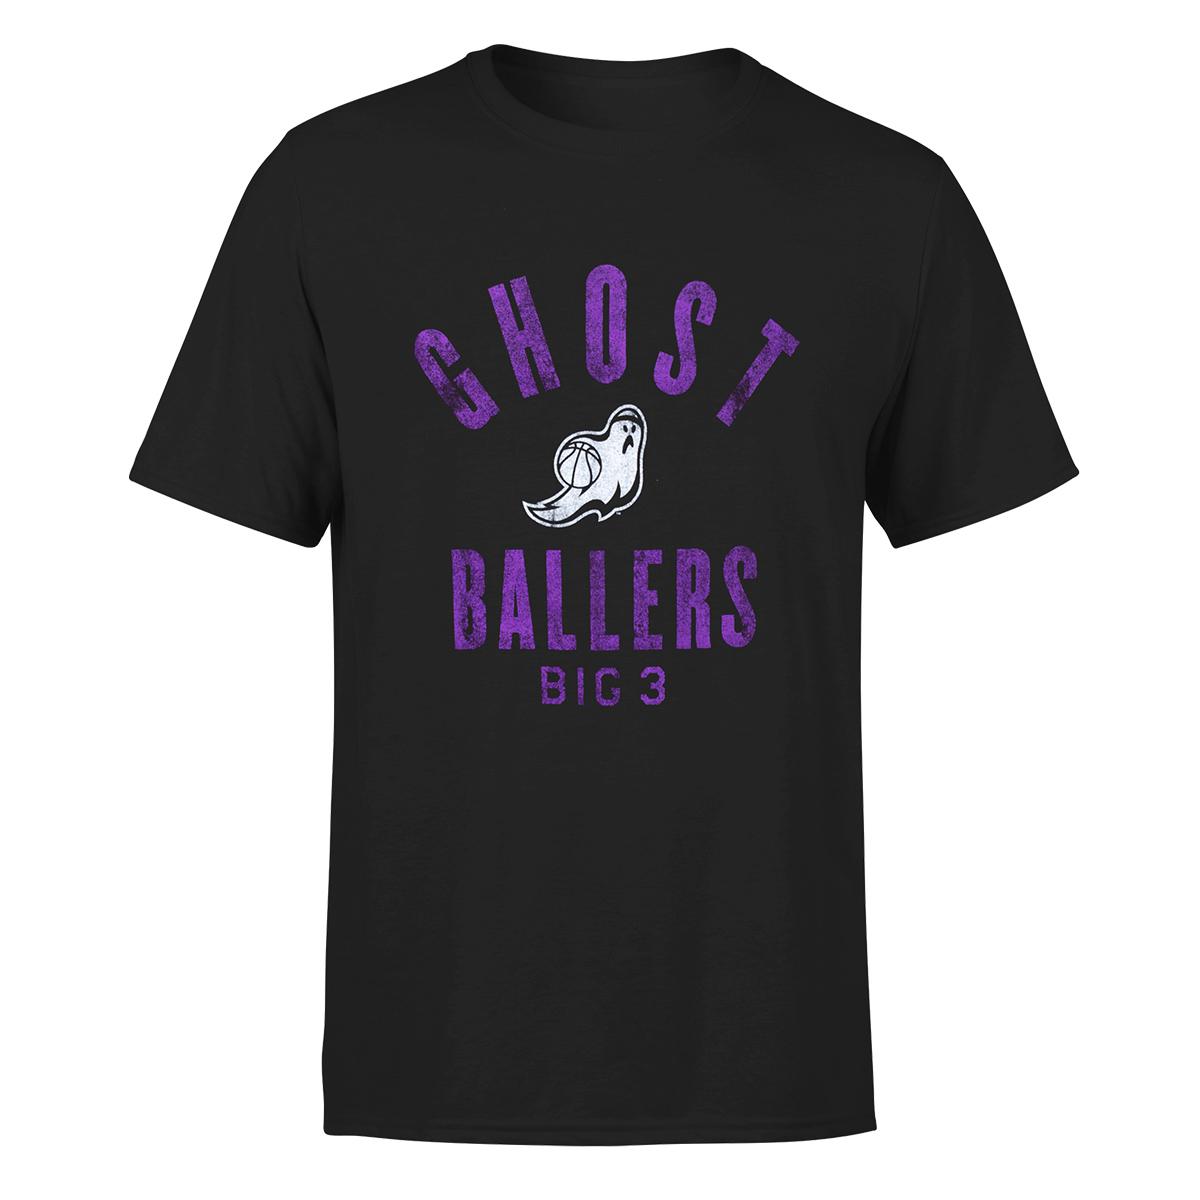 Ghost Ballers - Big 3 Black T-Shirt